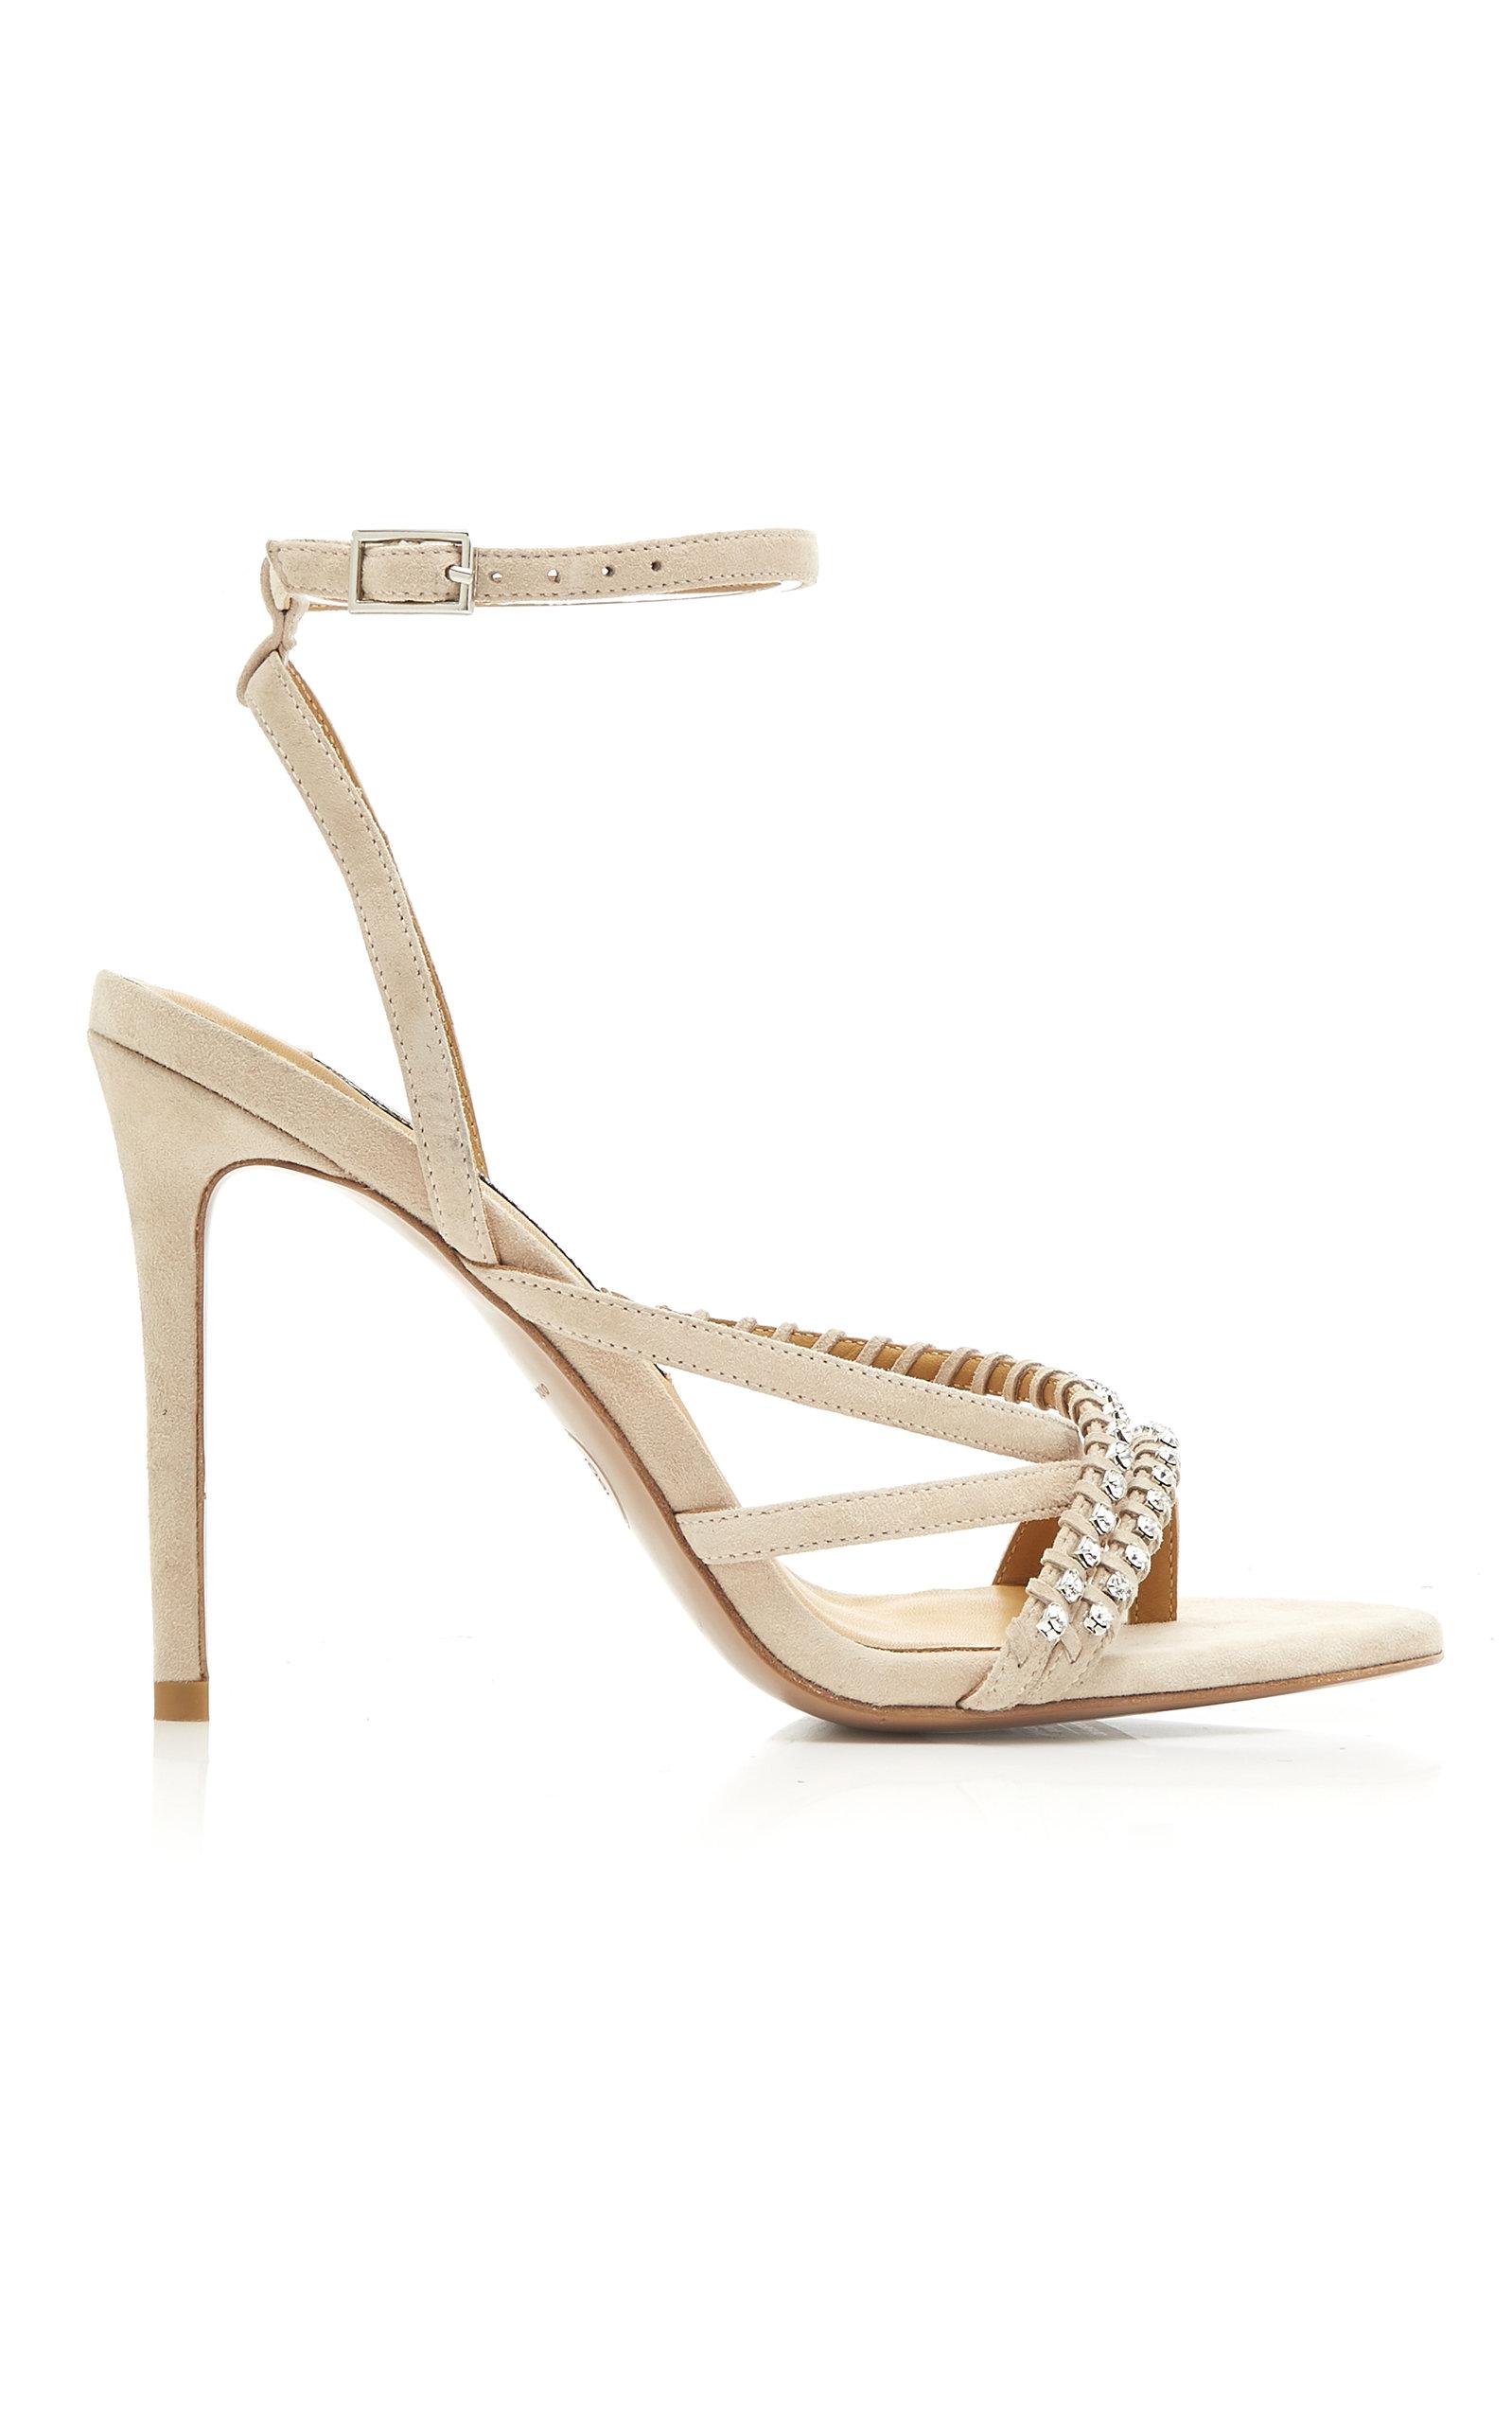 d40f46c55 Veronica Beard Noelle Crystal Suede Sandals In Neutral | ModeSens